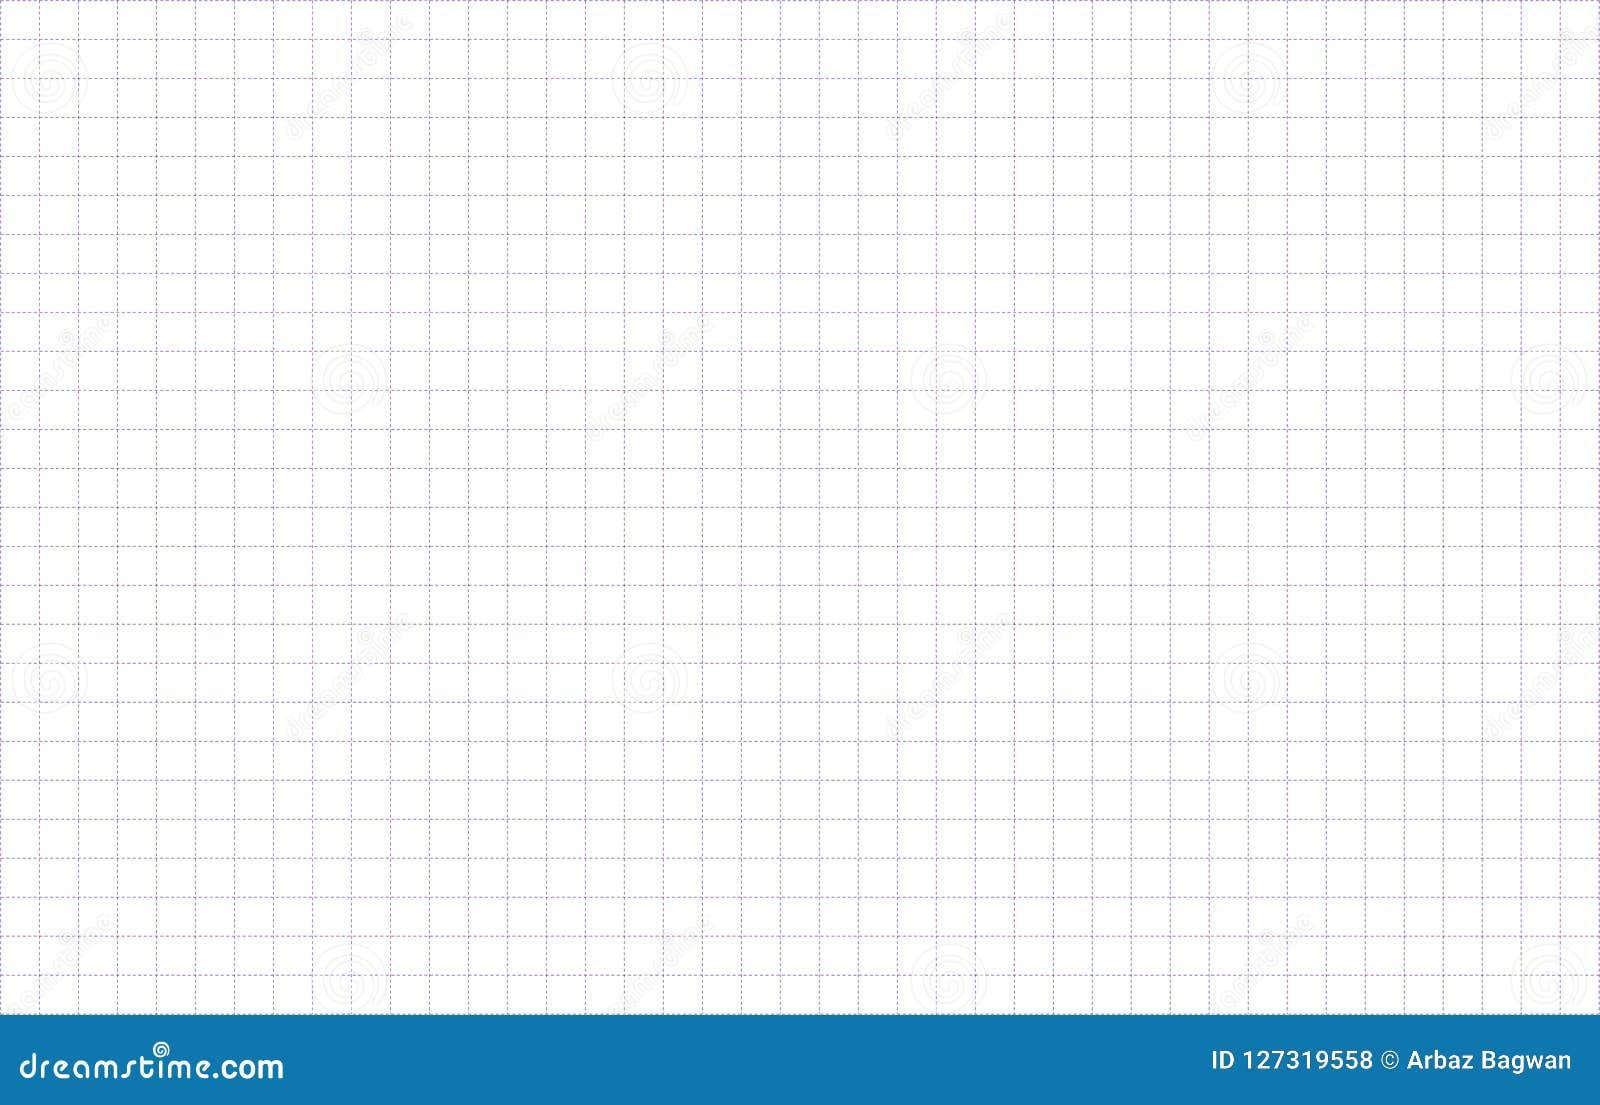 background grid graph paper stock vector illustration of blueprint